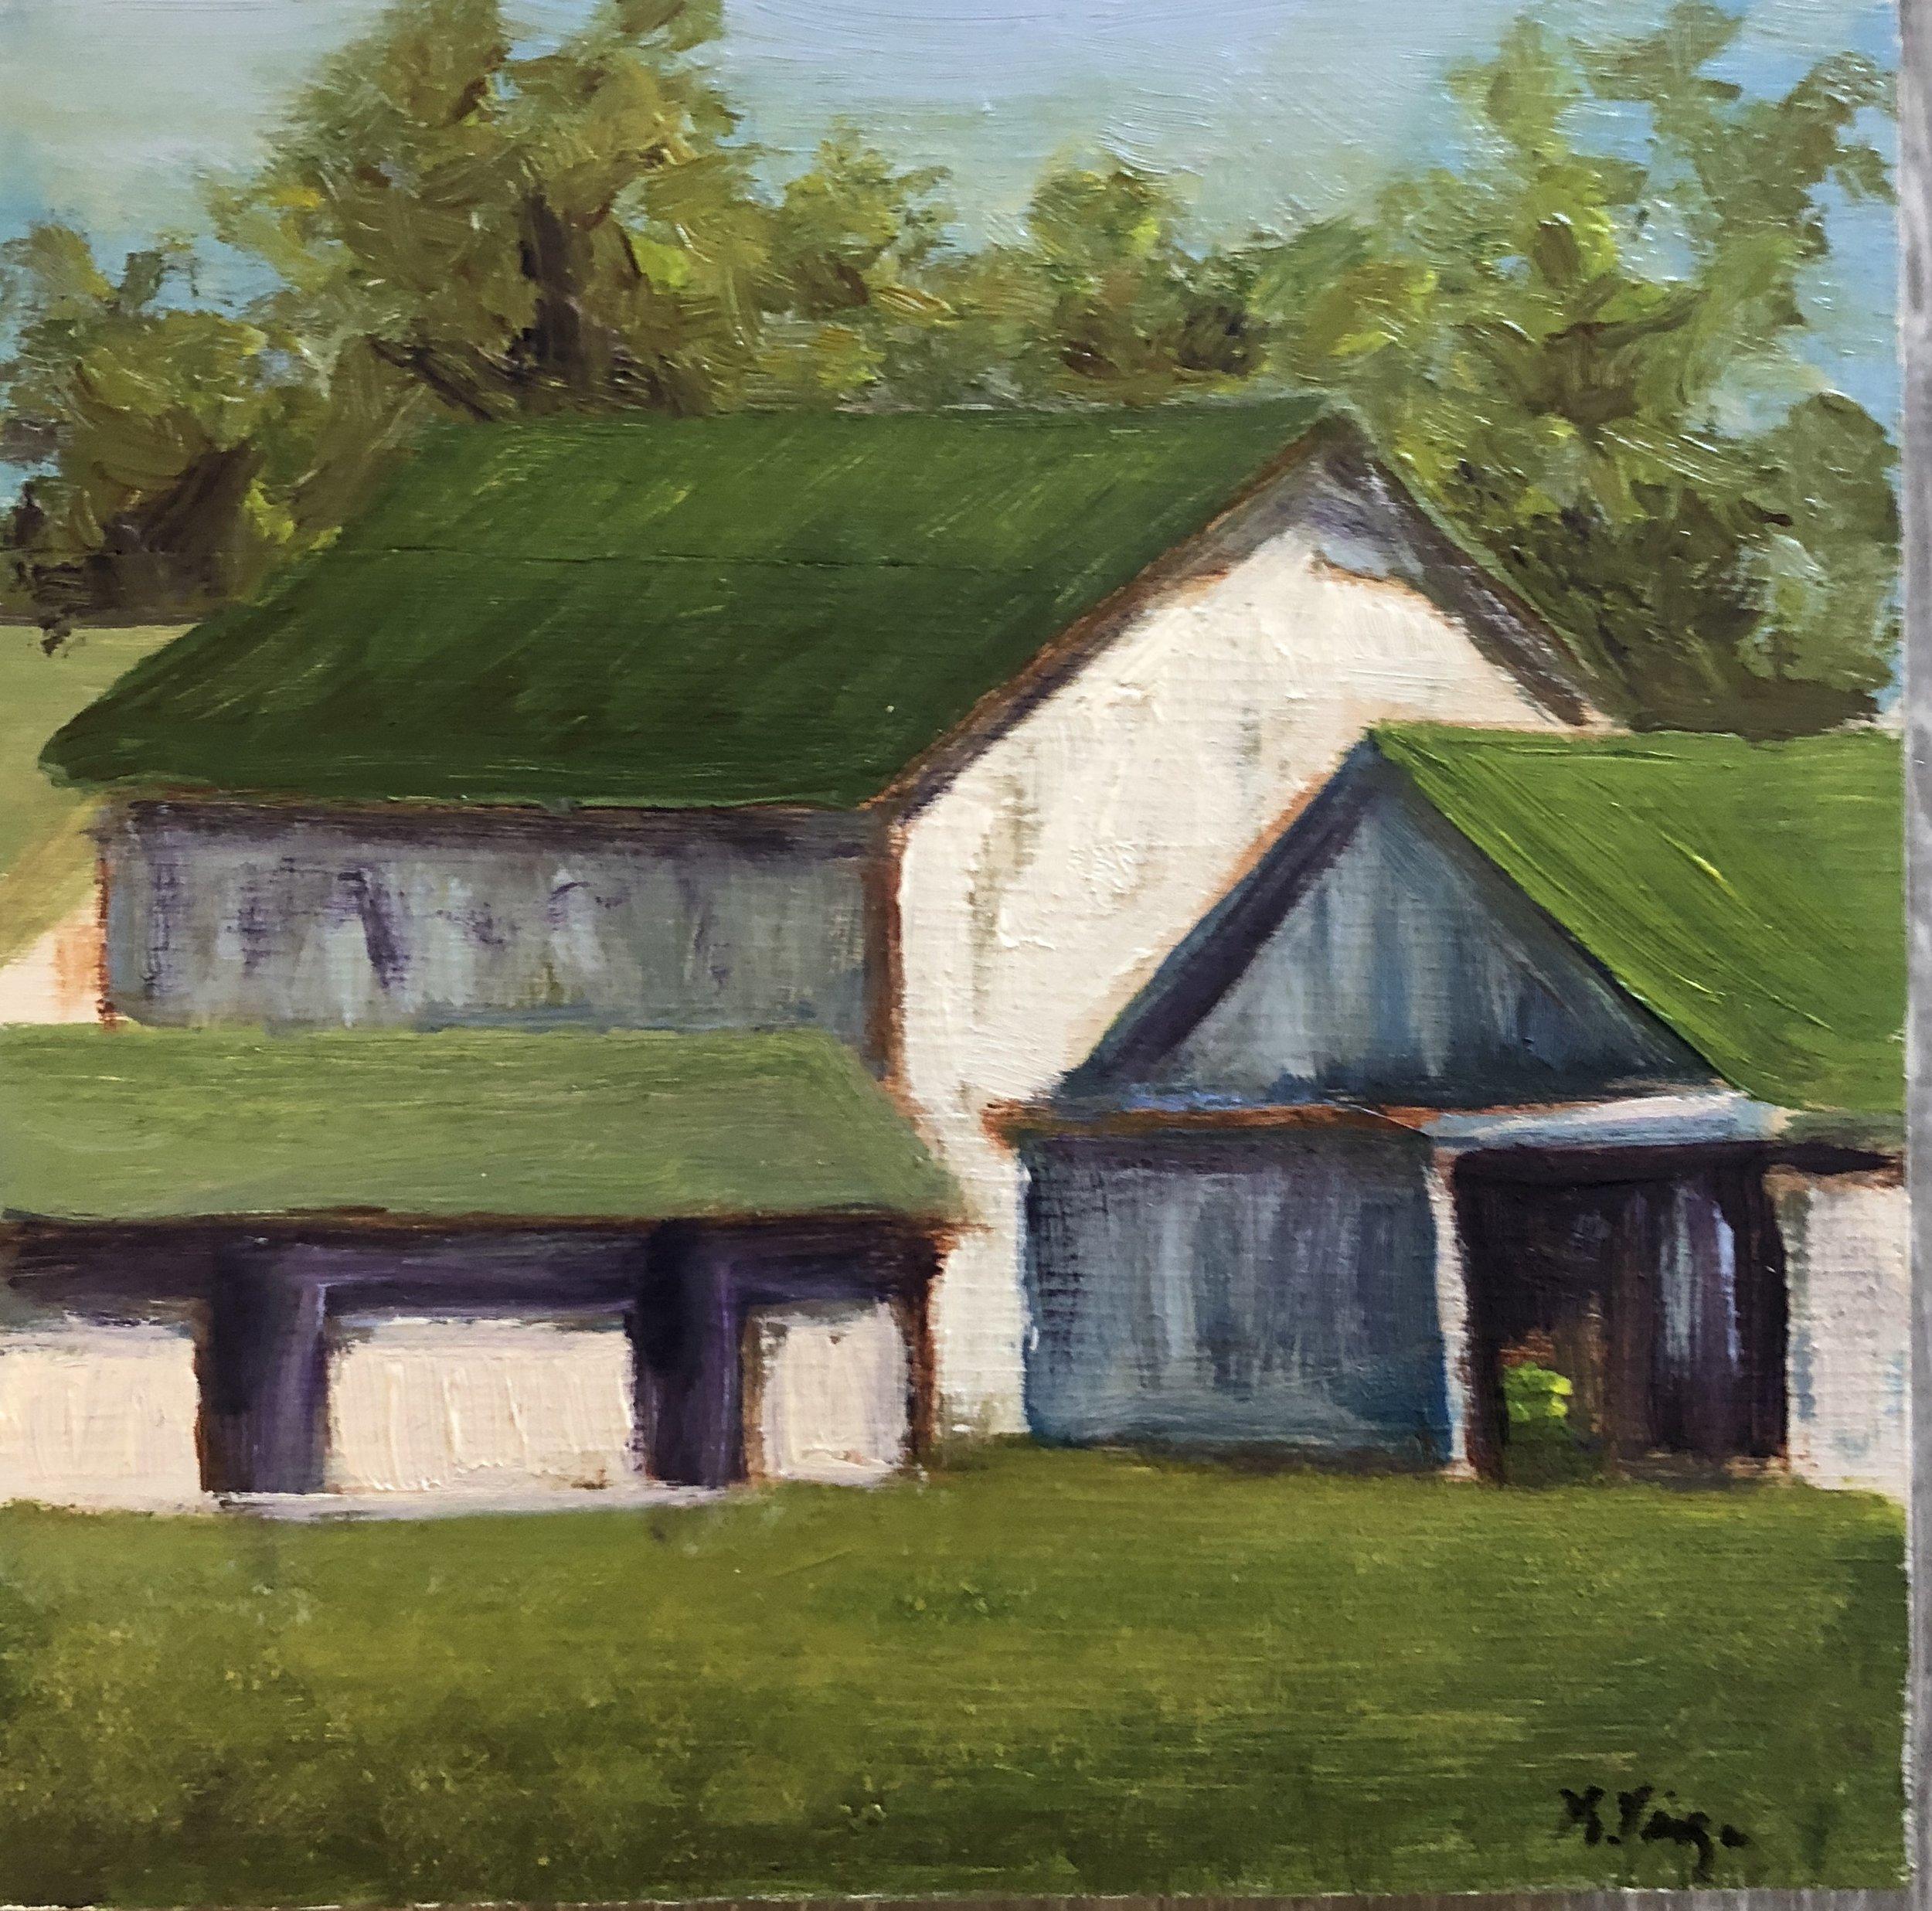 Green Roof Barn